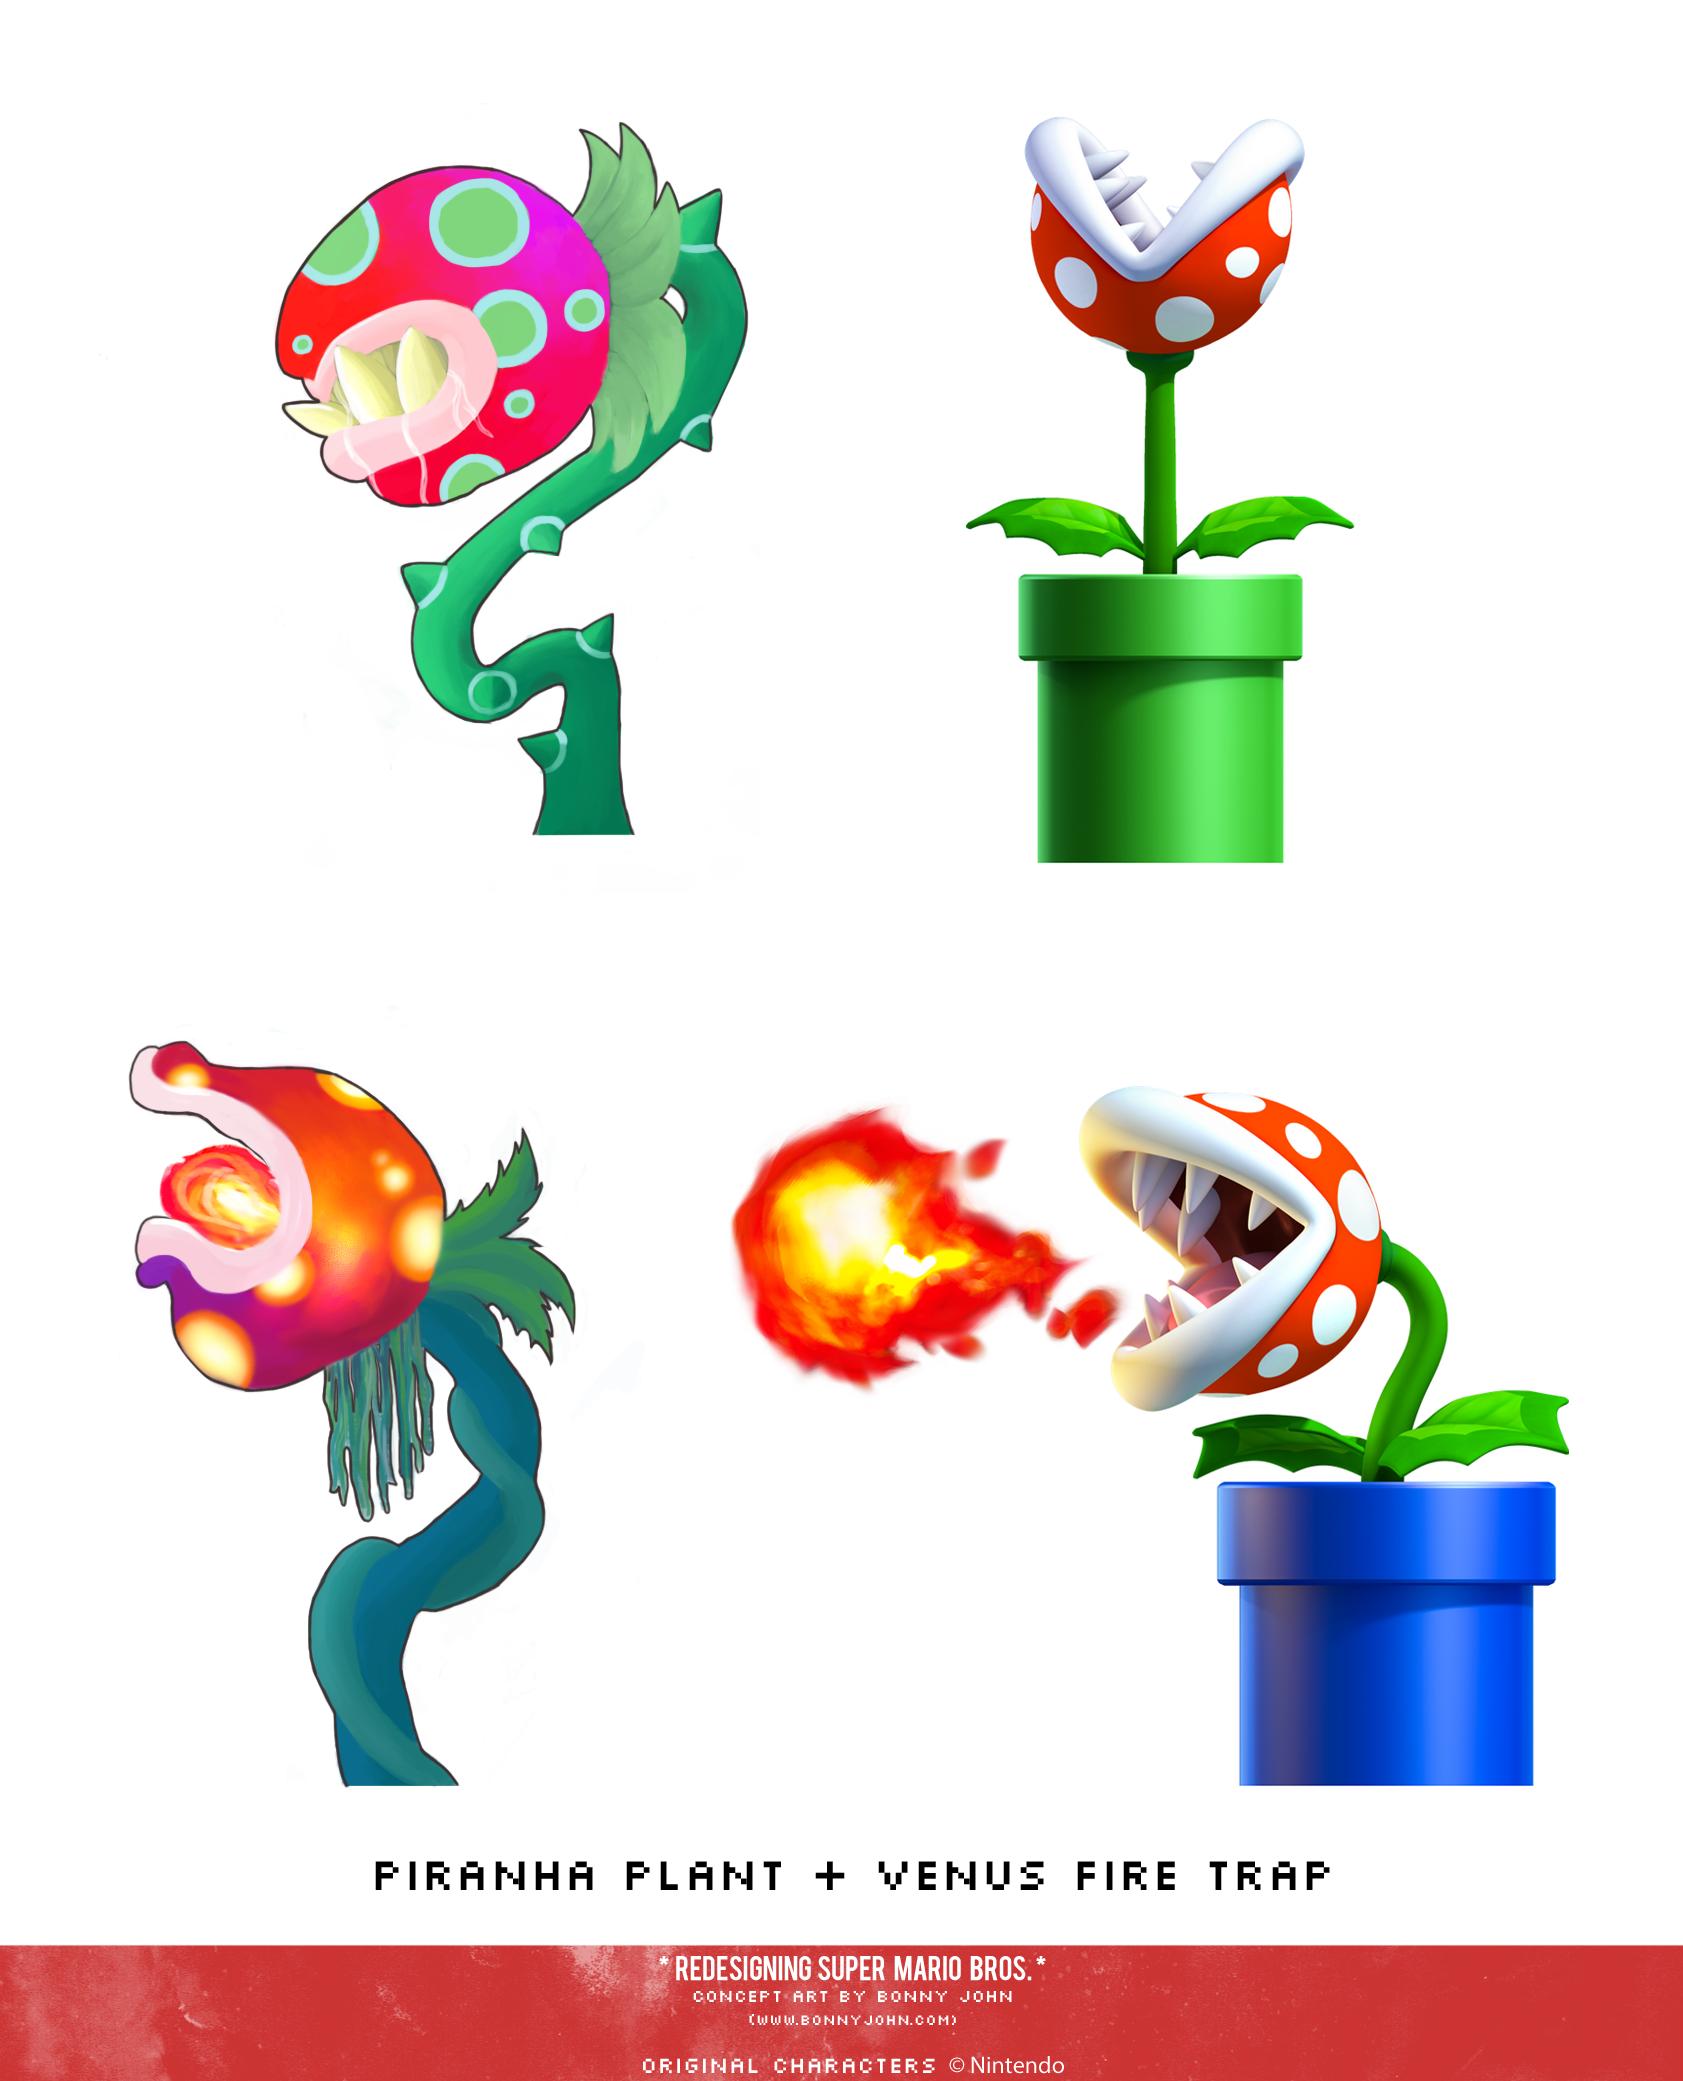 Piranha and Venus Fire Trap Redesign Comparison.png